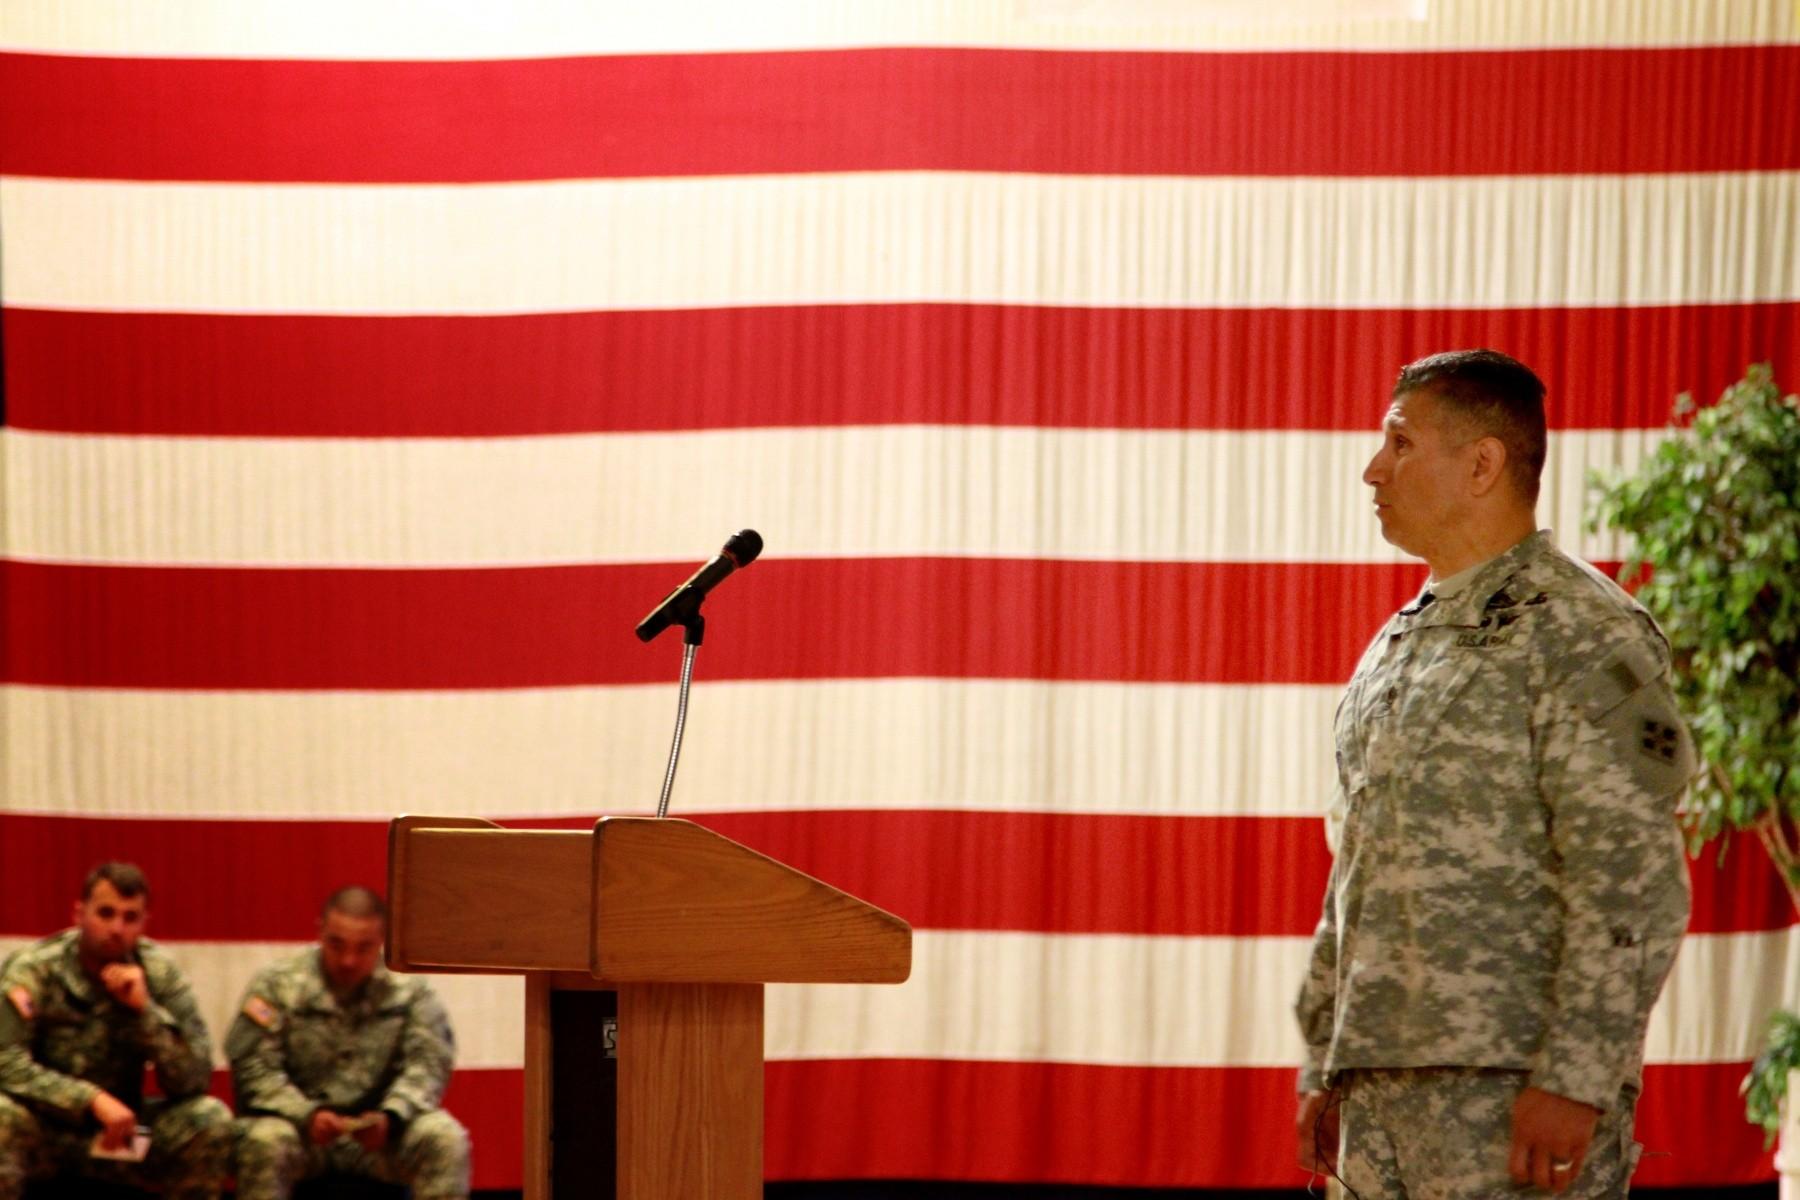 csm command philosophy Company commander/first sergeant, battalion commander/battalion csm, and  overall officer/nco  sample battalion command philosophy memorandum  129.